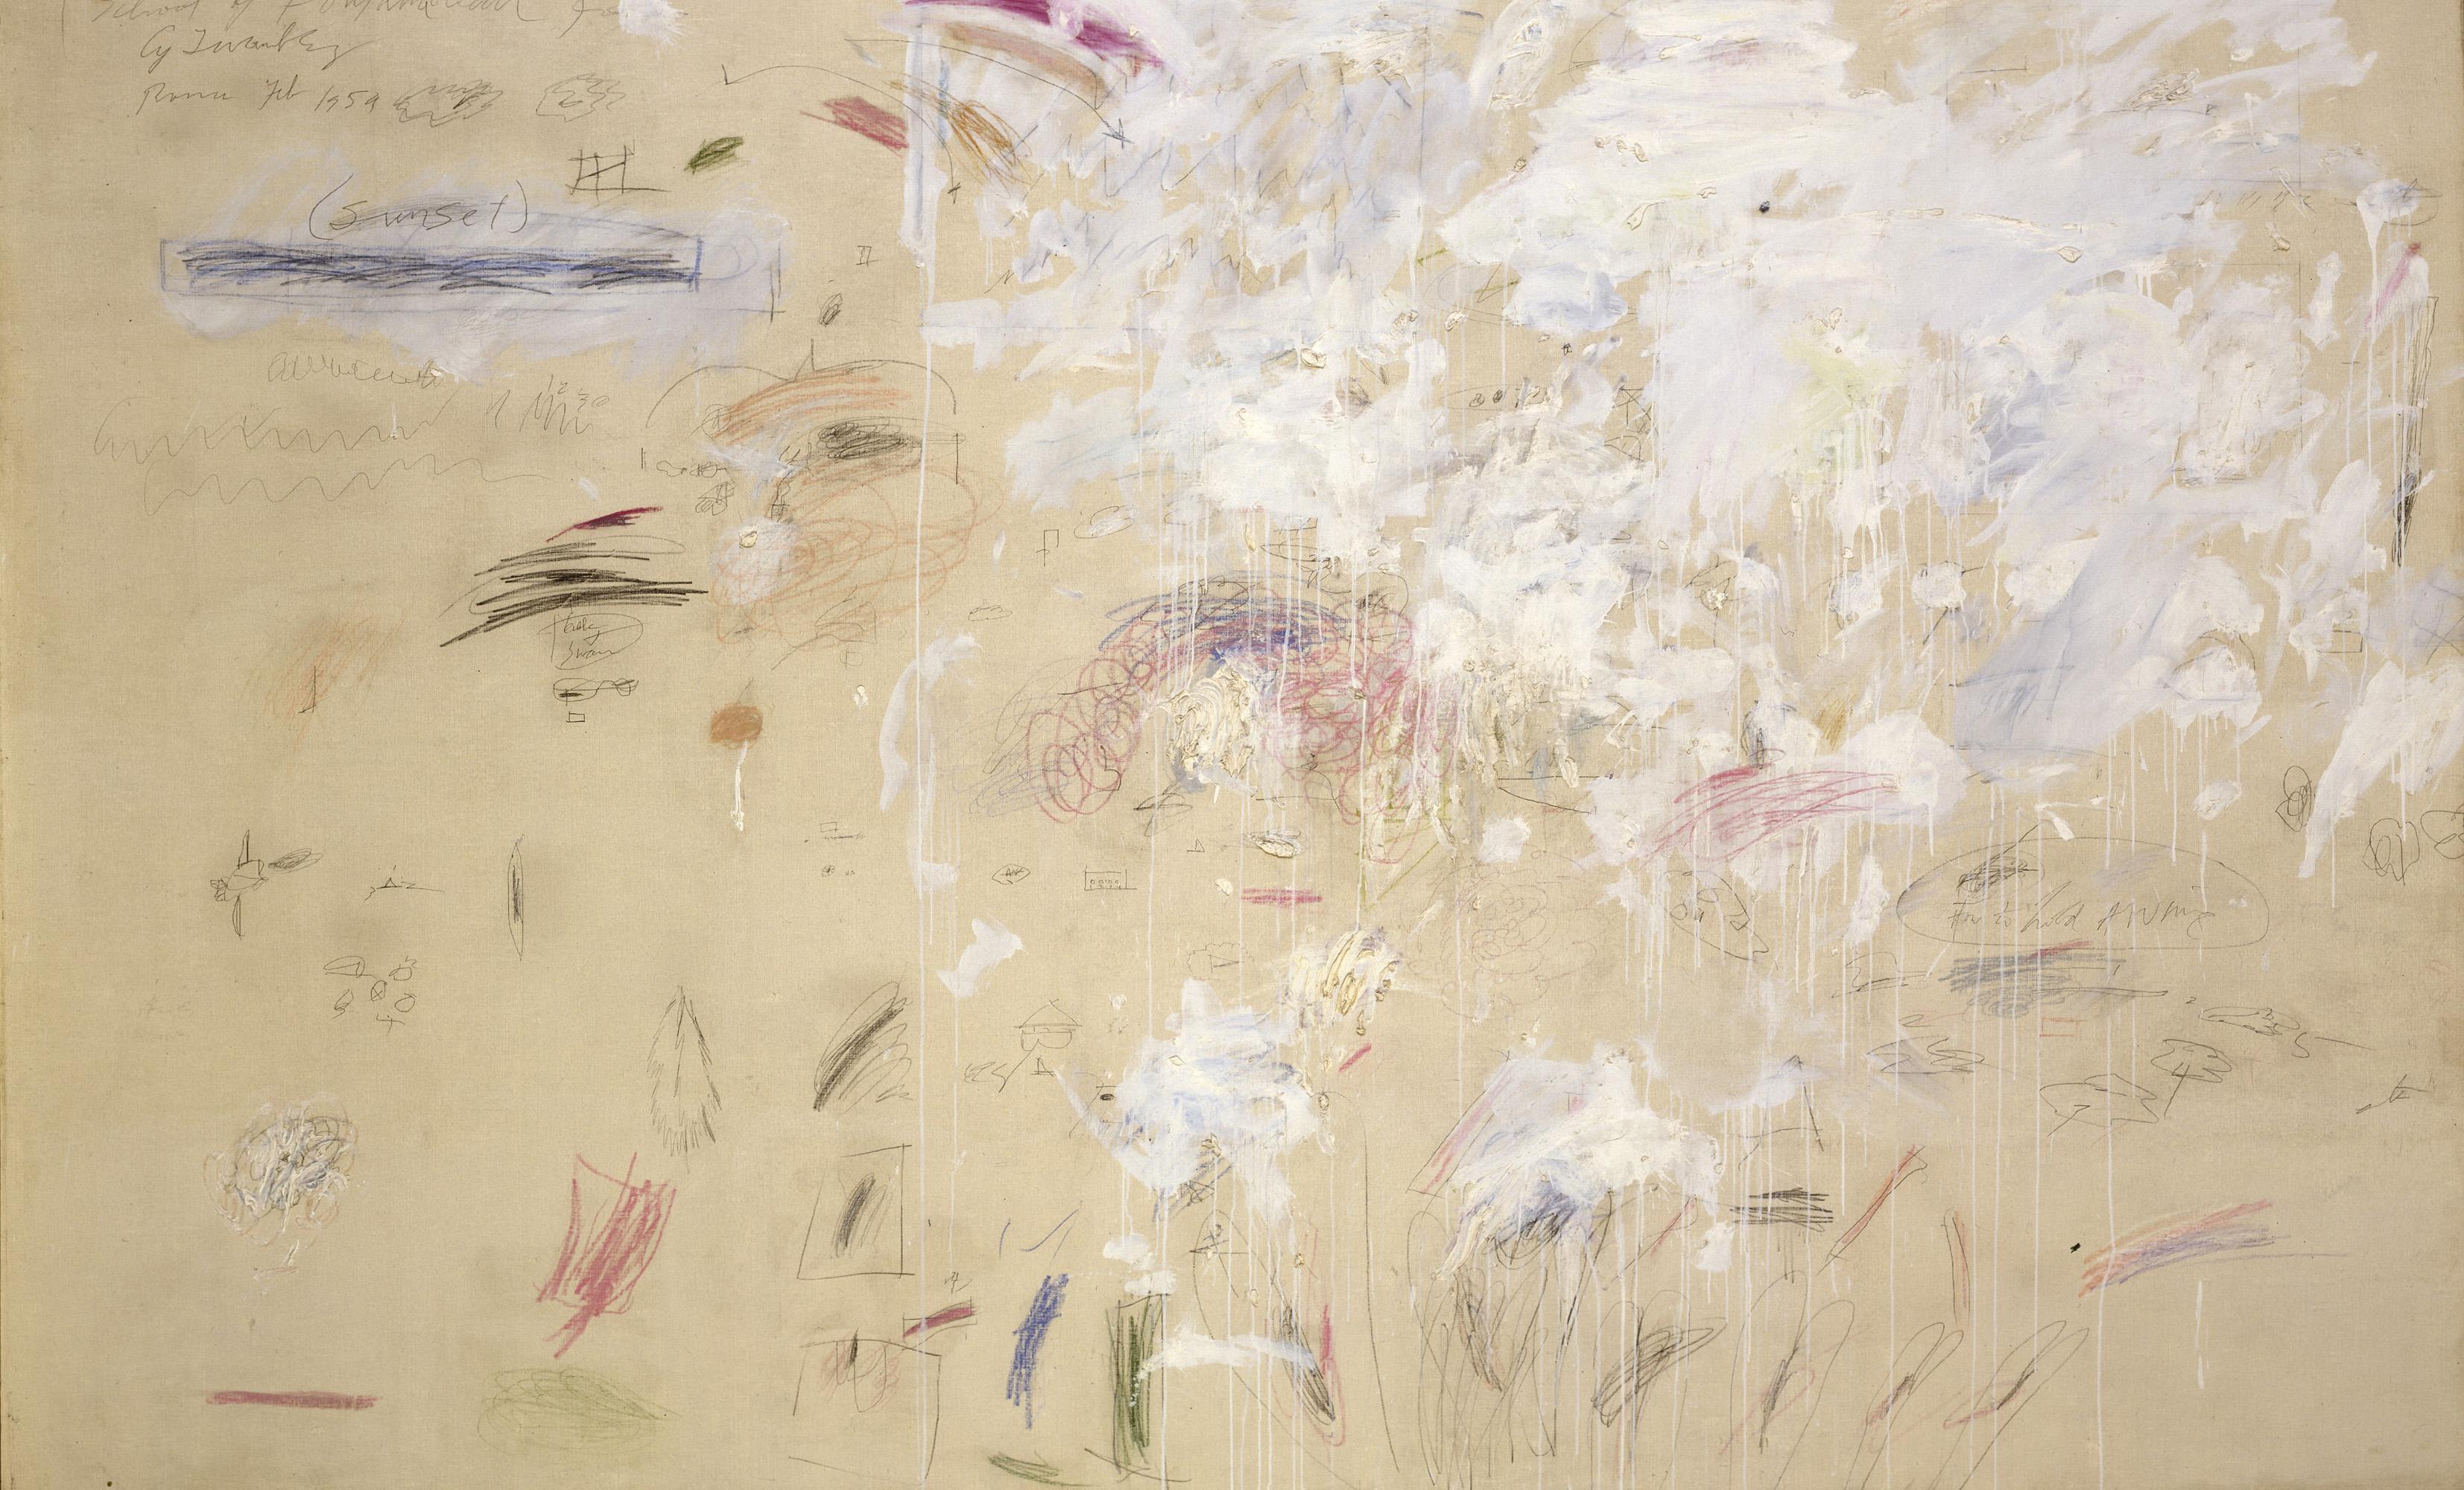 Cy Twombly, School of Fontainebleau, 1960, Öl, Wachs-, Farb- und Bleistift auf L